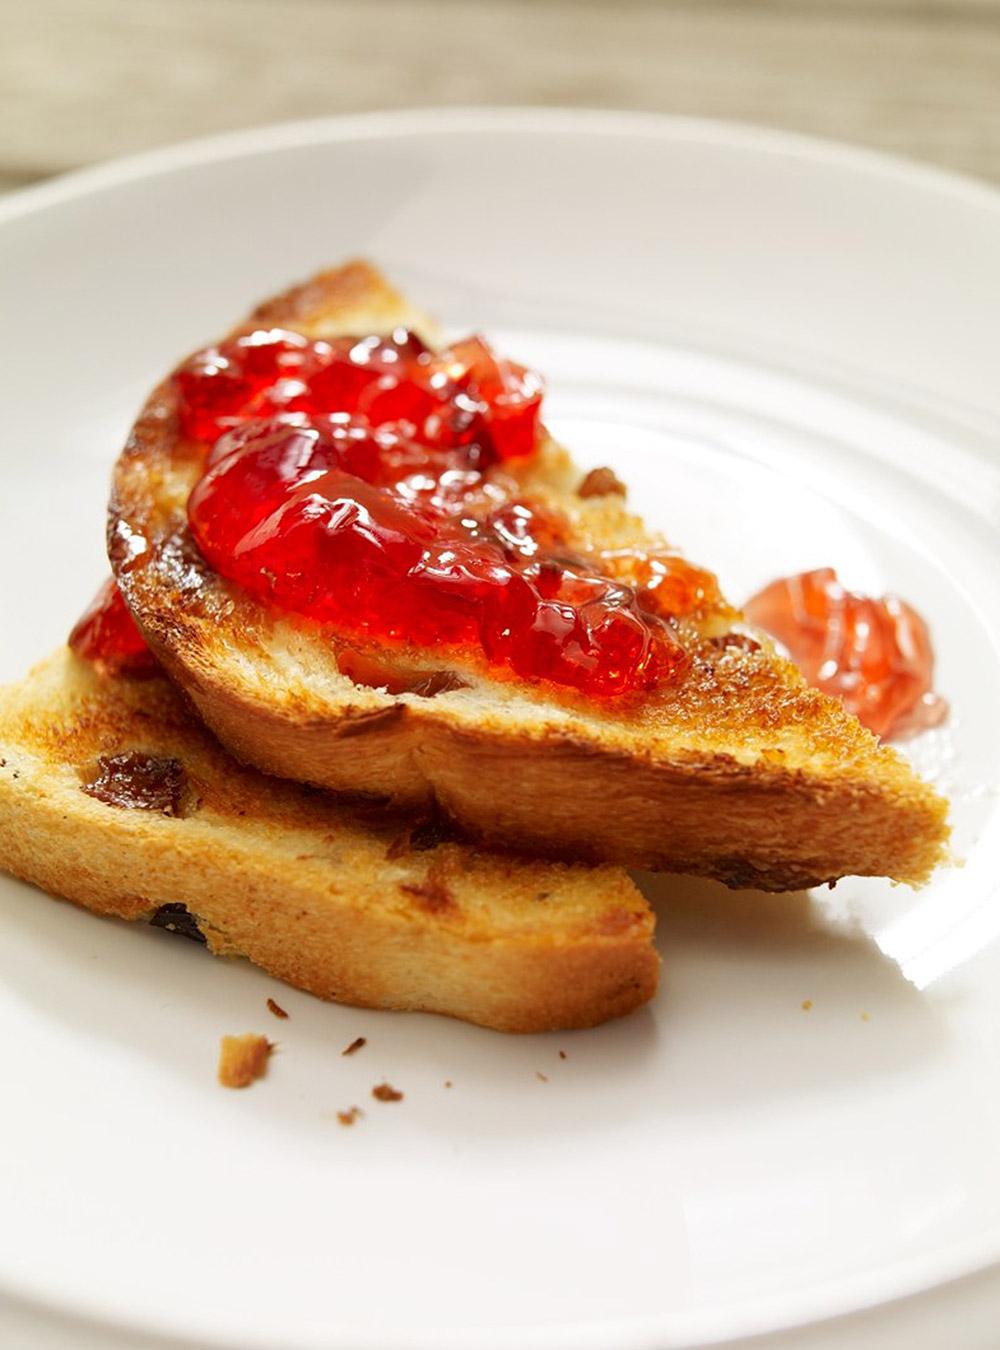 Crabapple Jelly Ricardo - Écumer cuisine